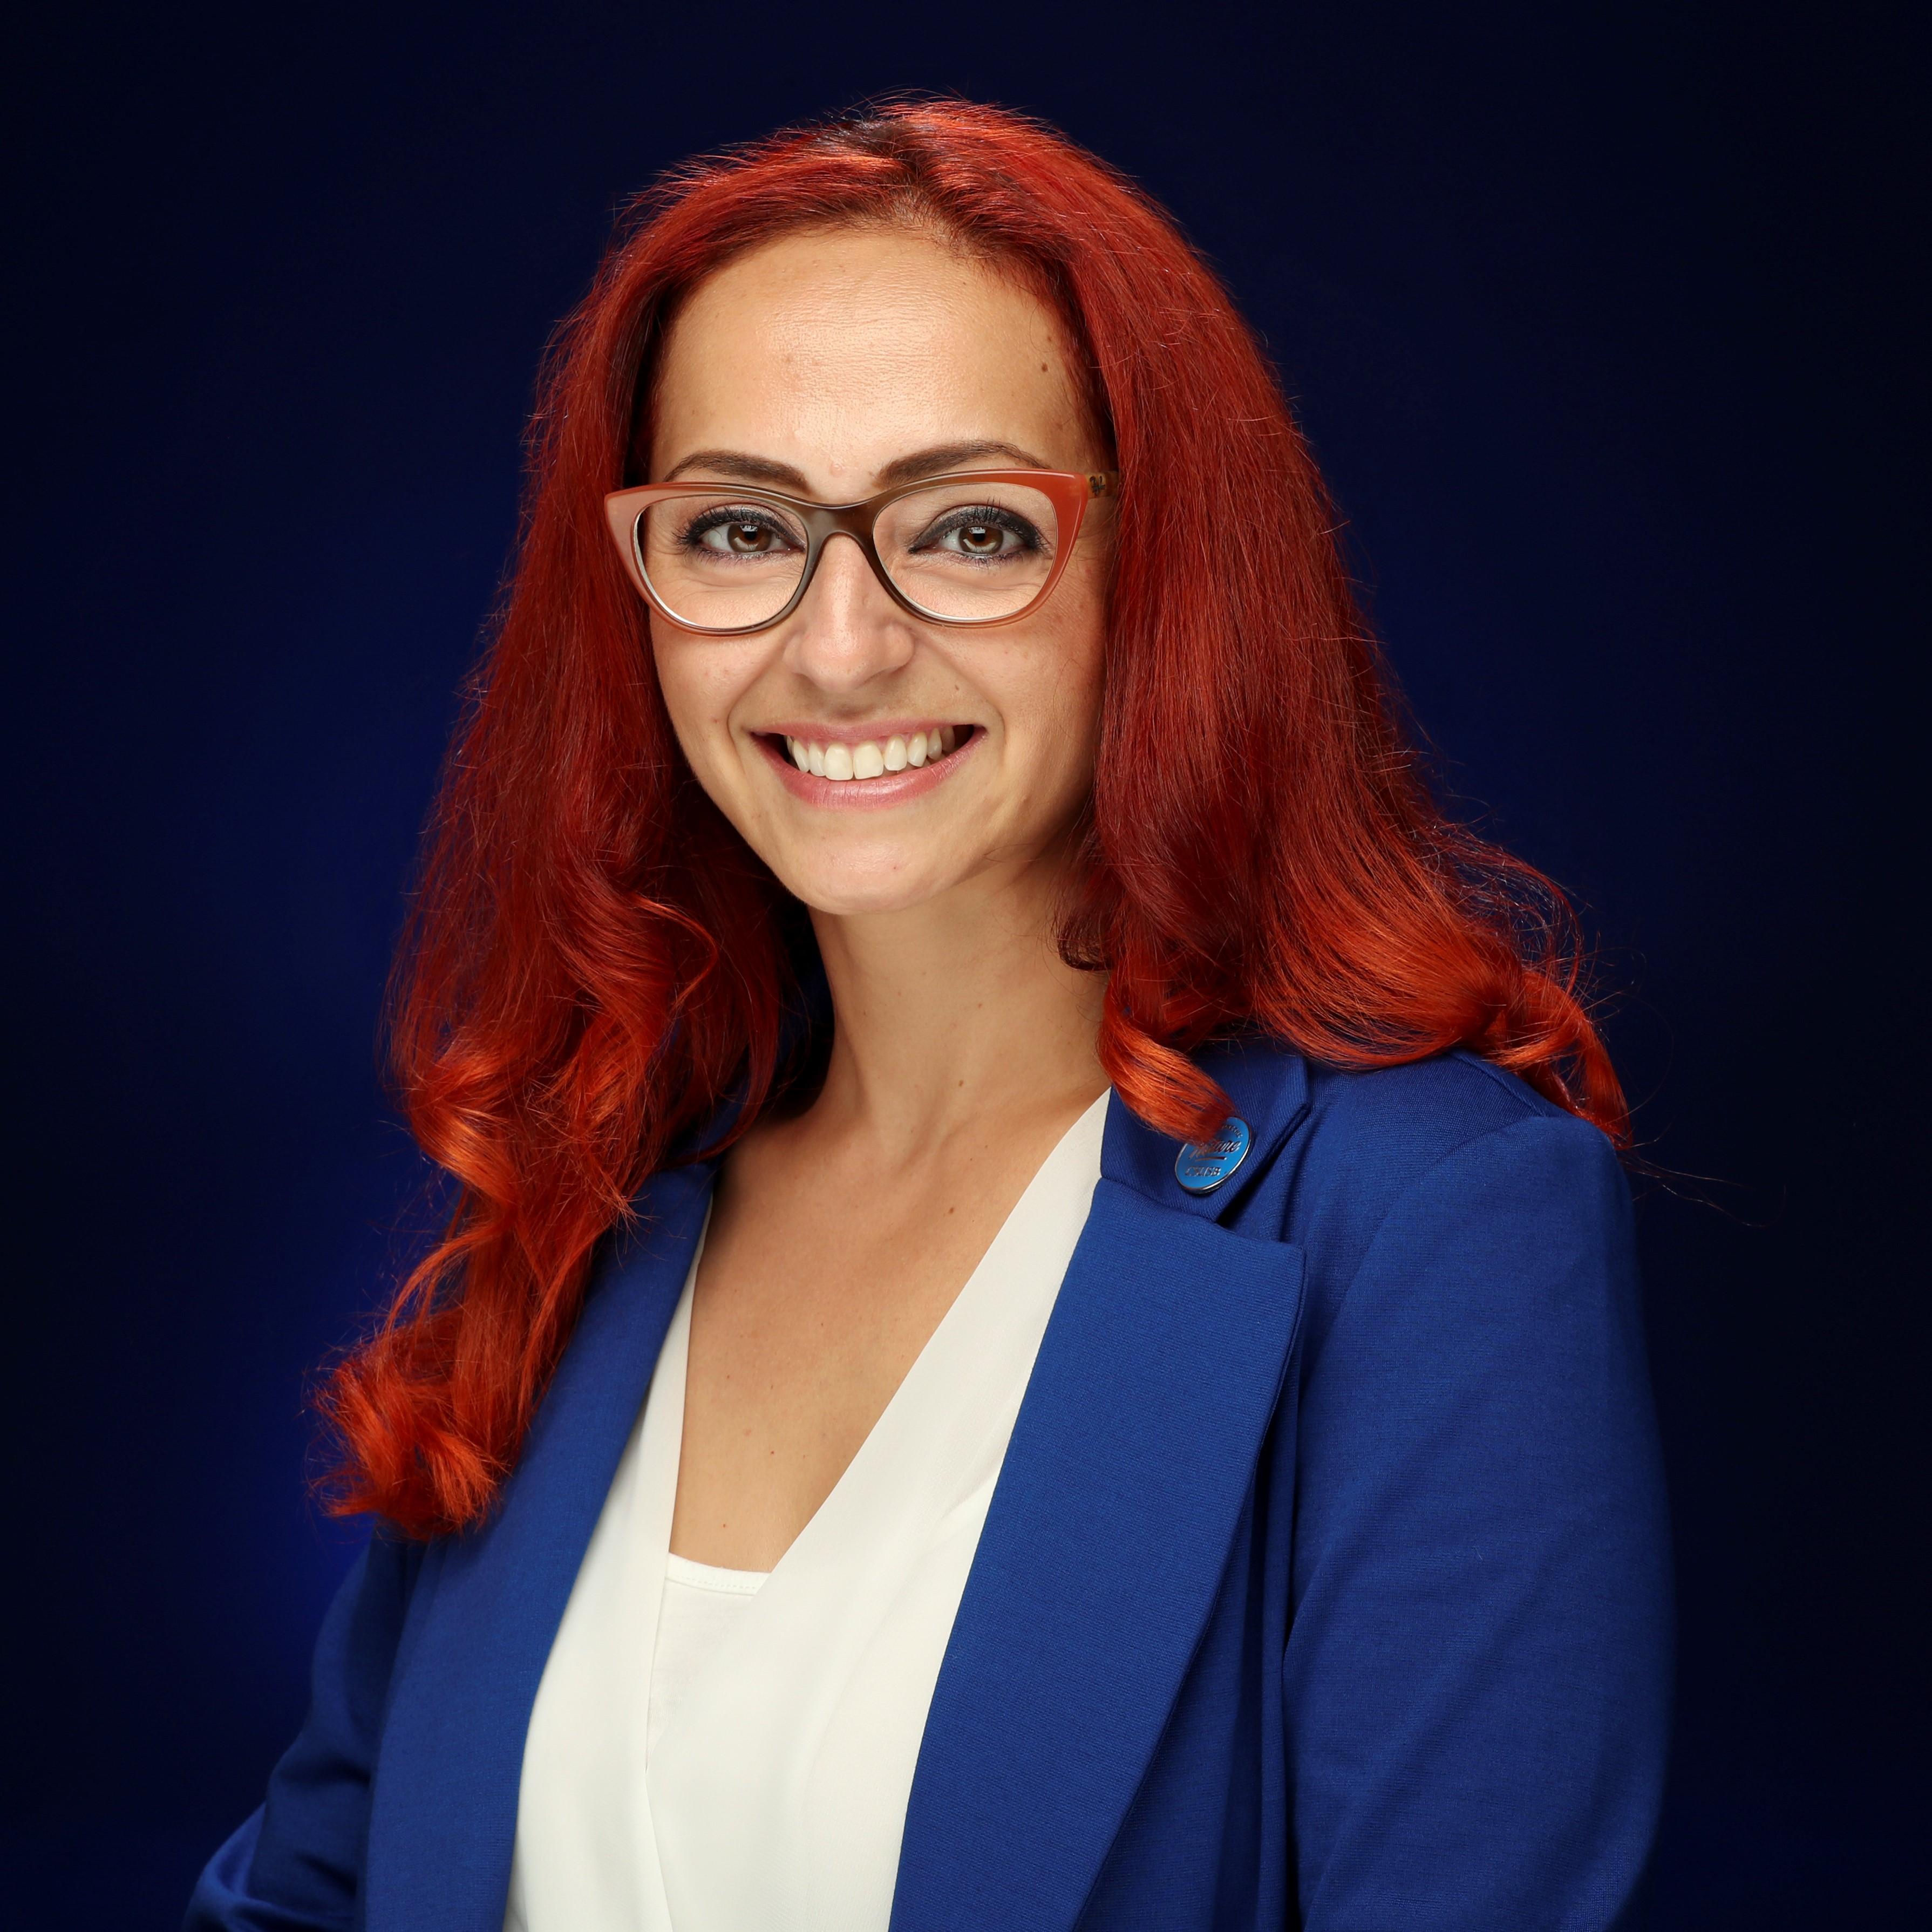 Olga Valdivia